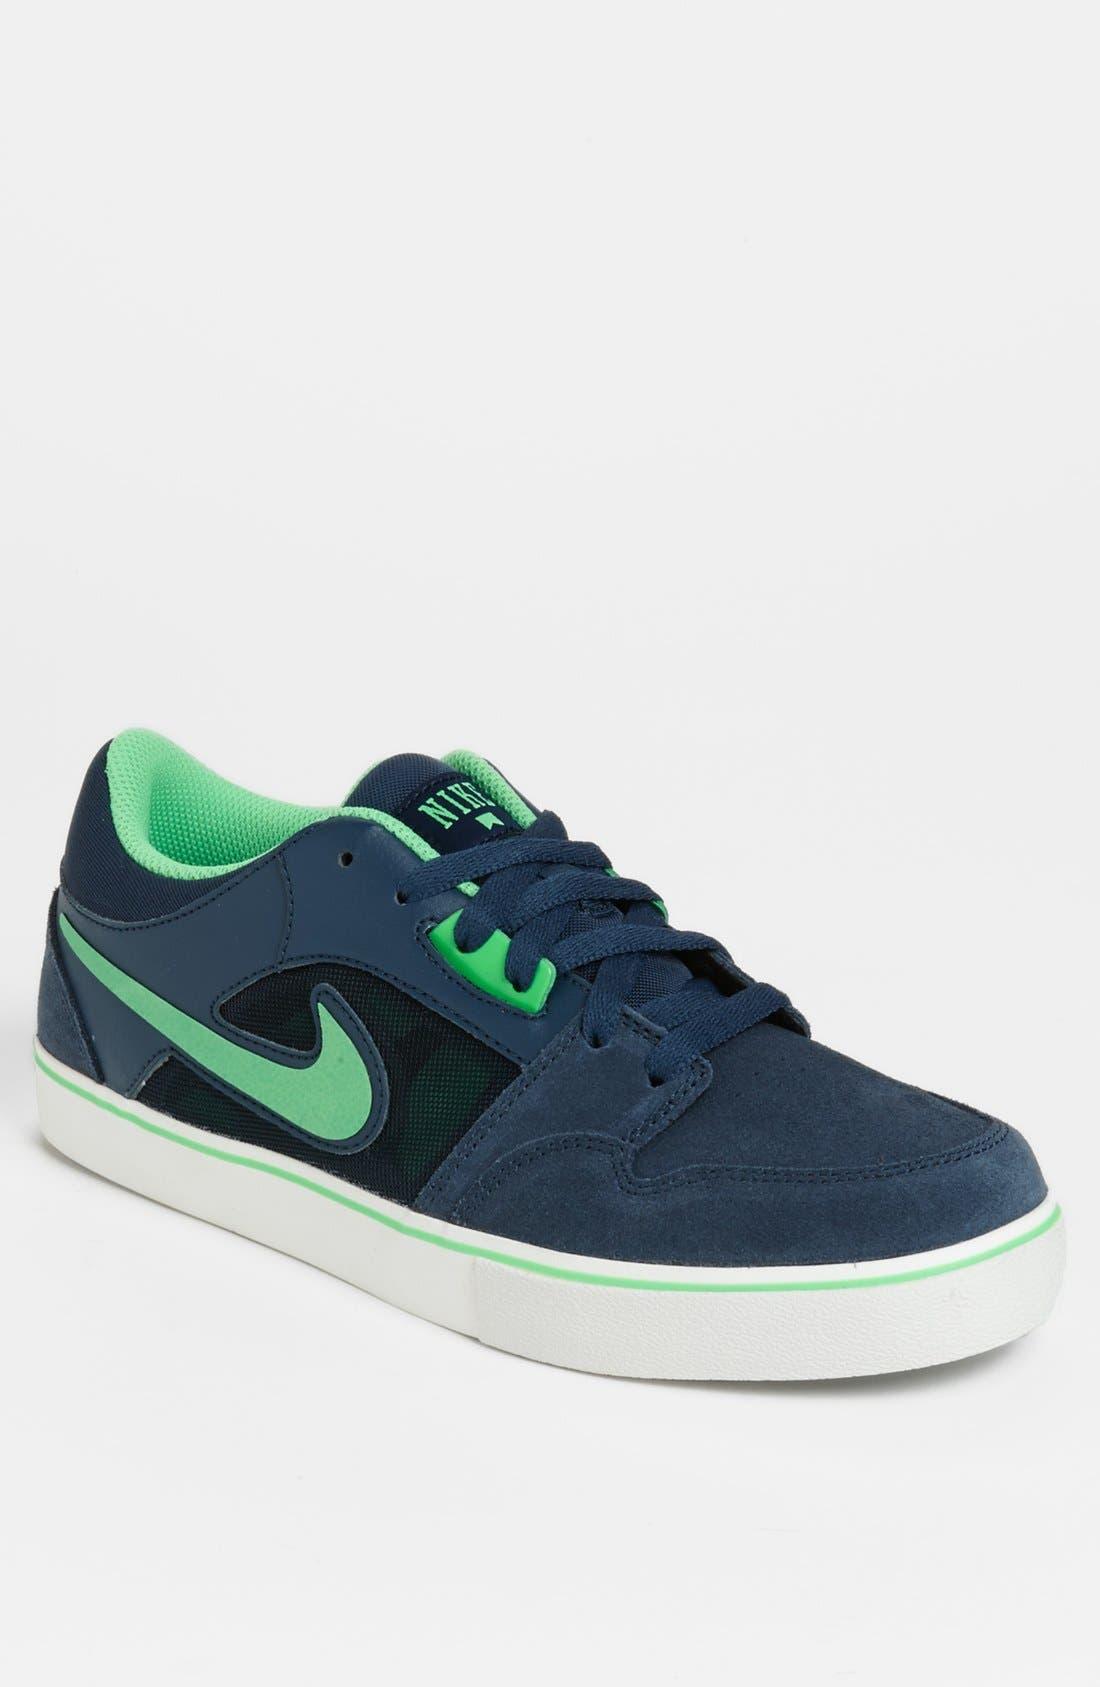 Main Image - Nike 'Ruckus 2 LR' Skate Shoe (Men)